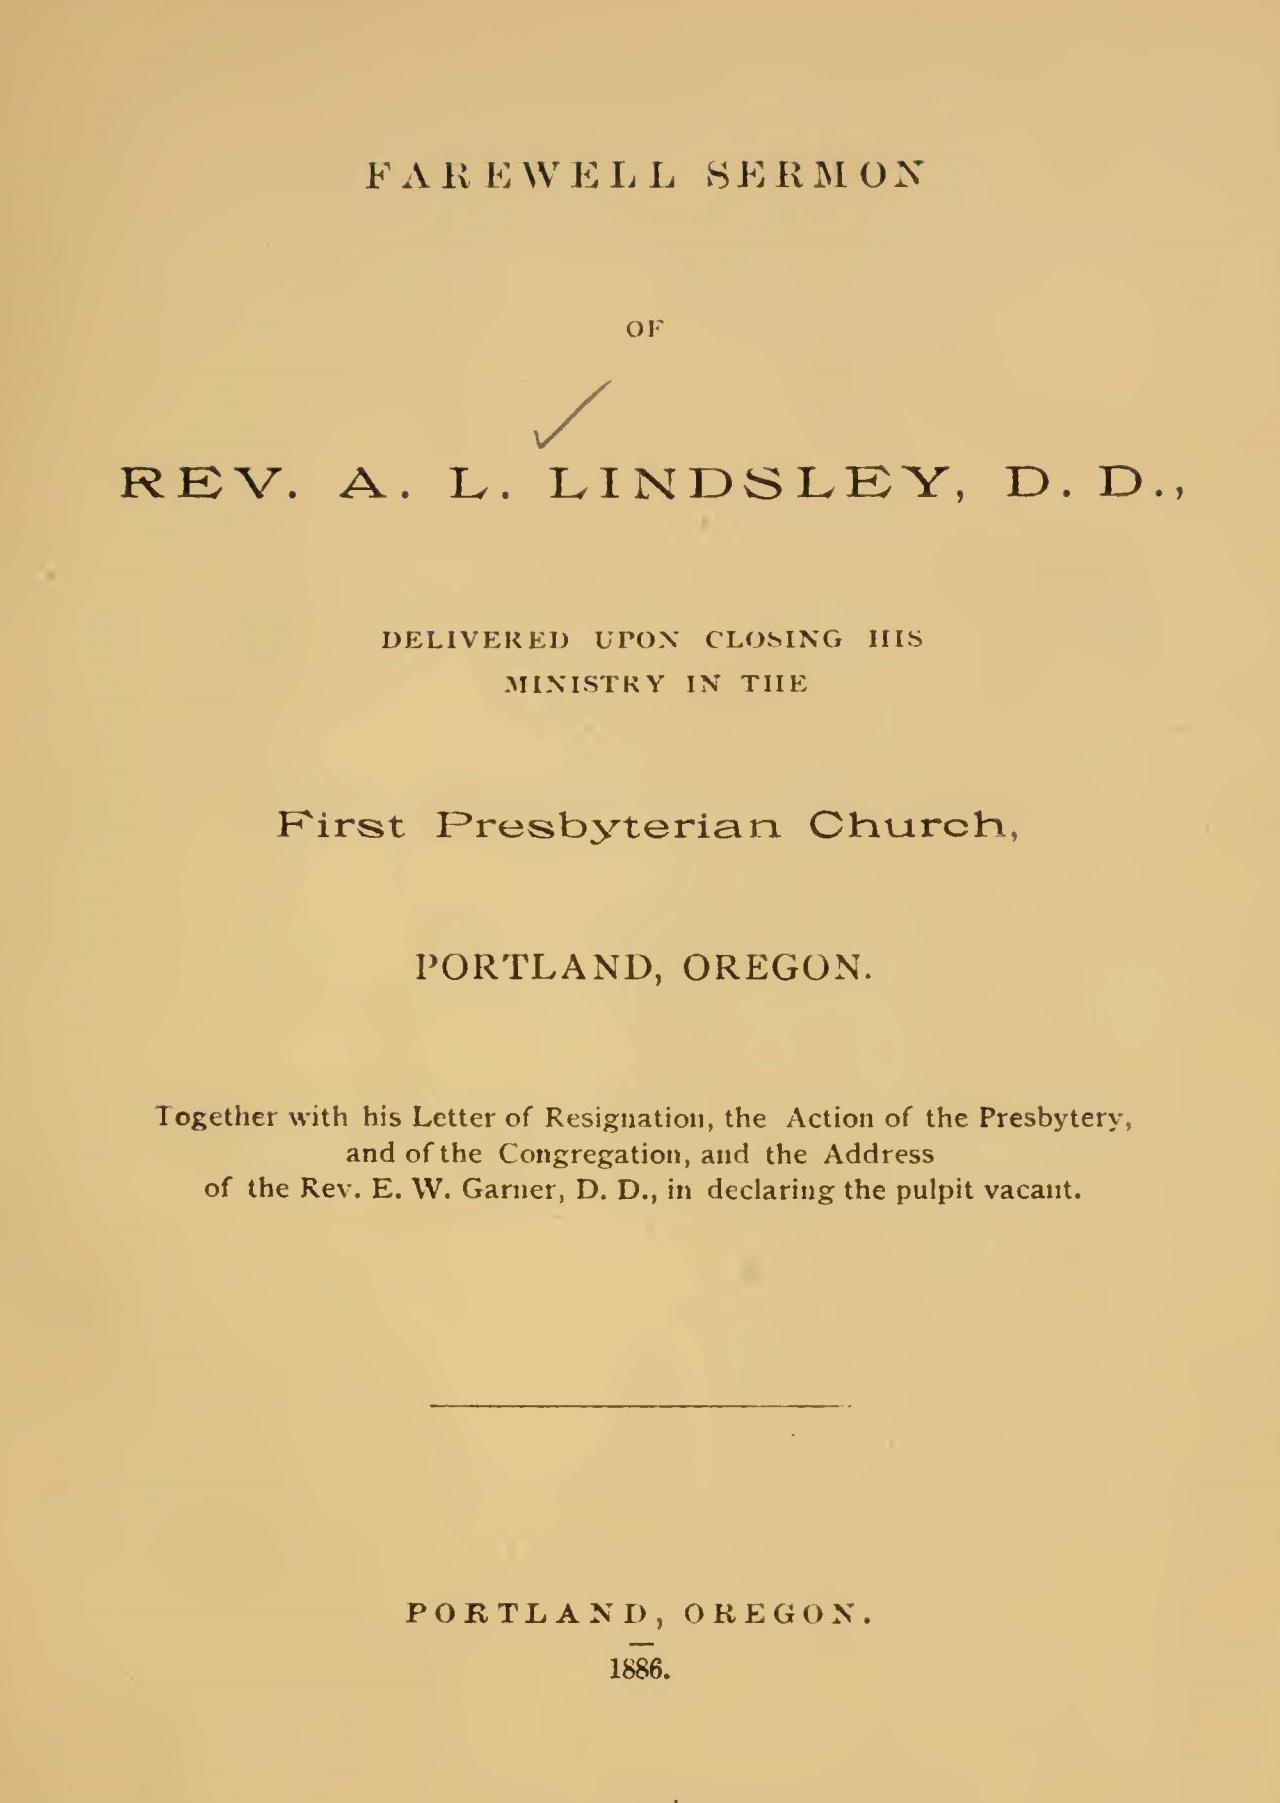 Lindsley, Aaron Ladner, Farewell Sermon Title Page.jpg